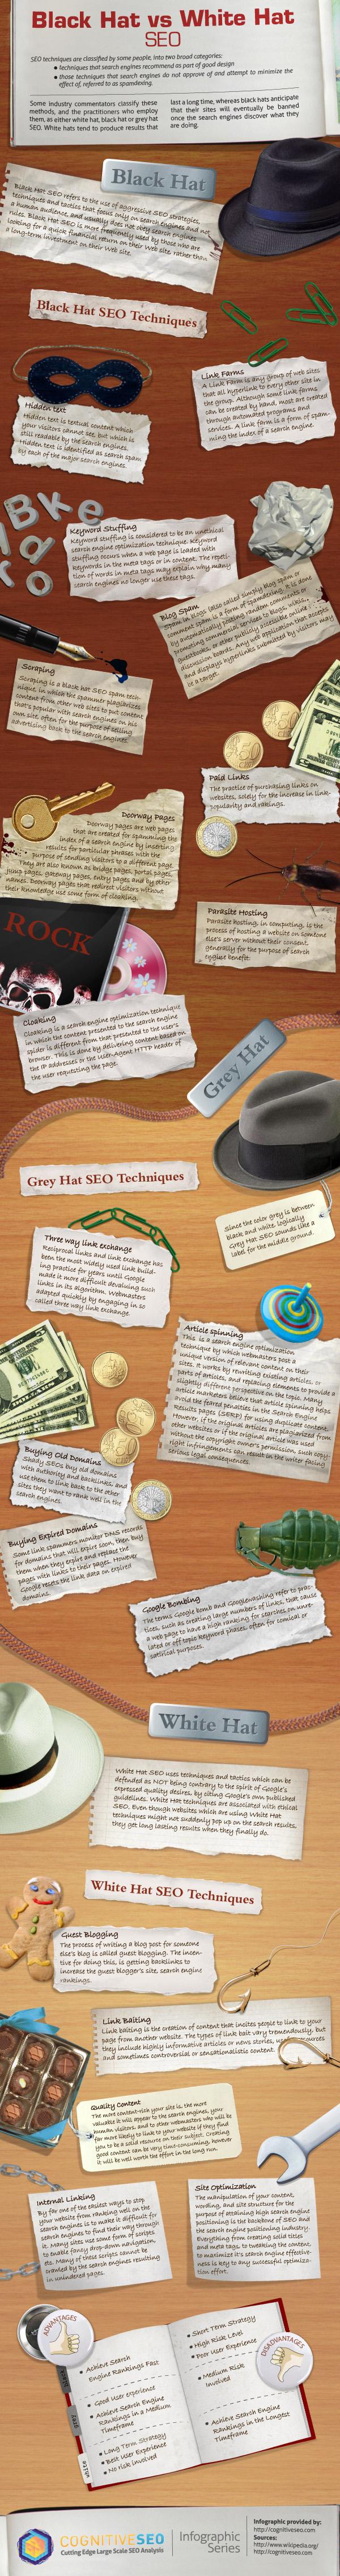 Black Hat White Hat Cognitive SEO